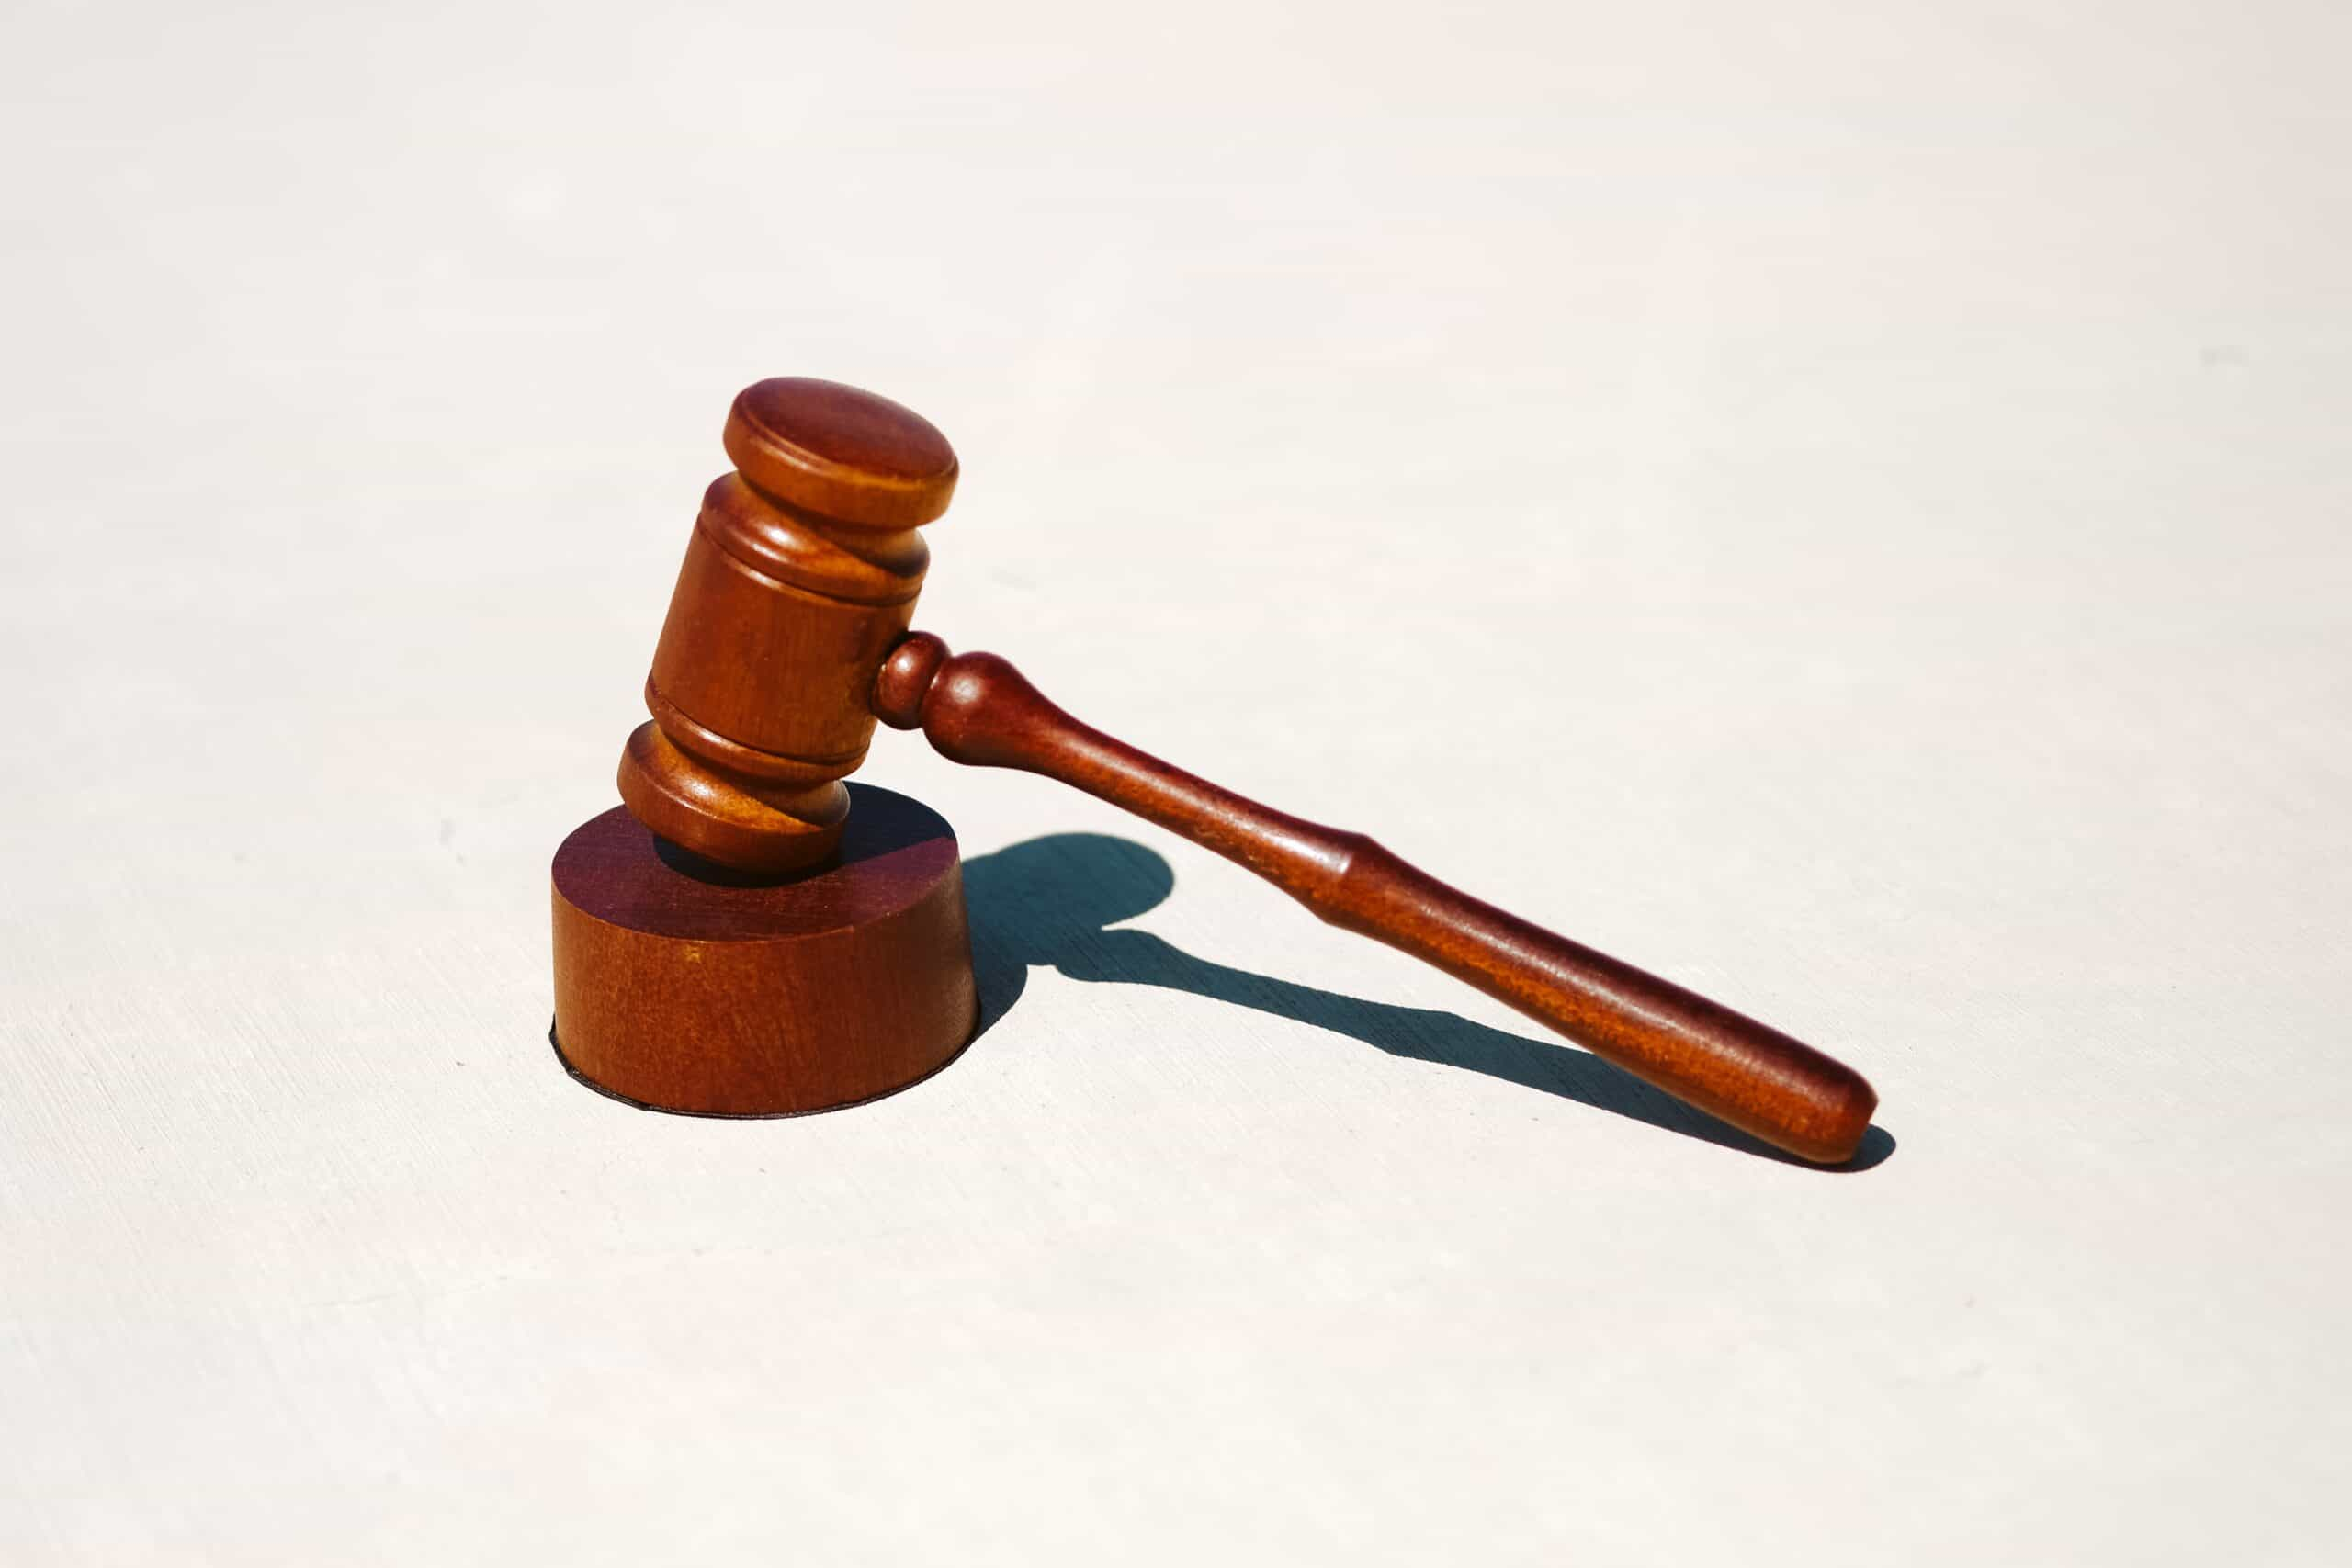 regulation judge gavel